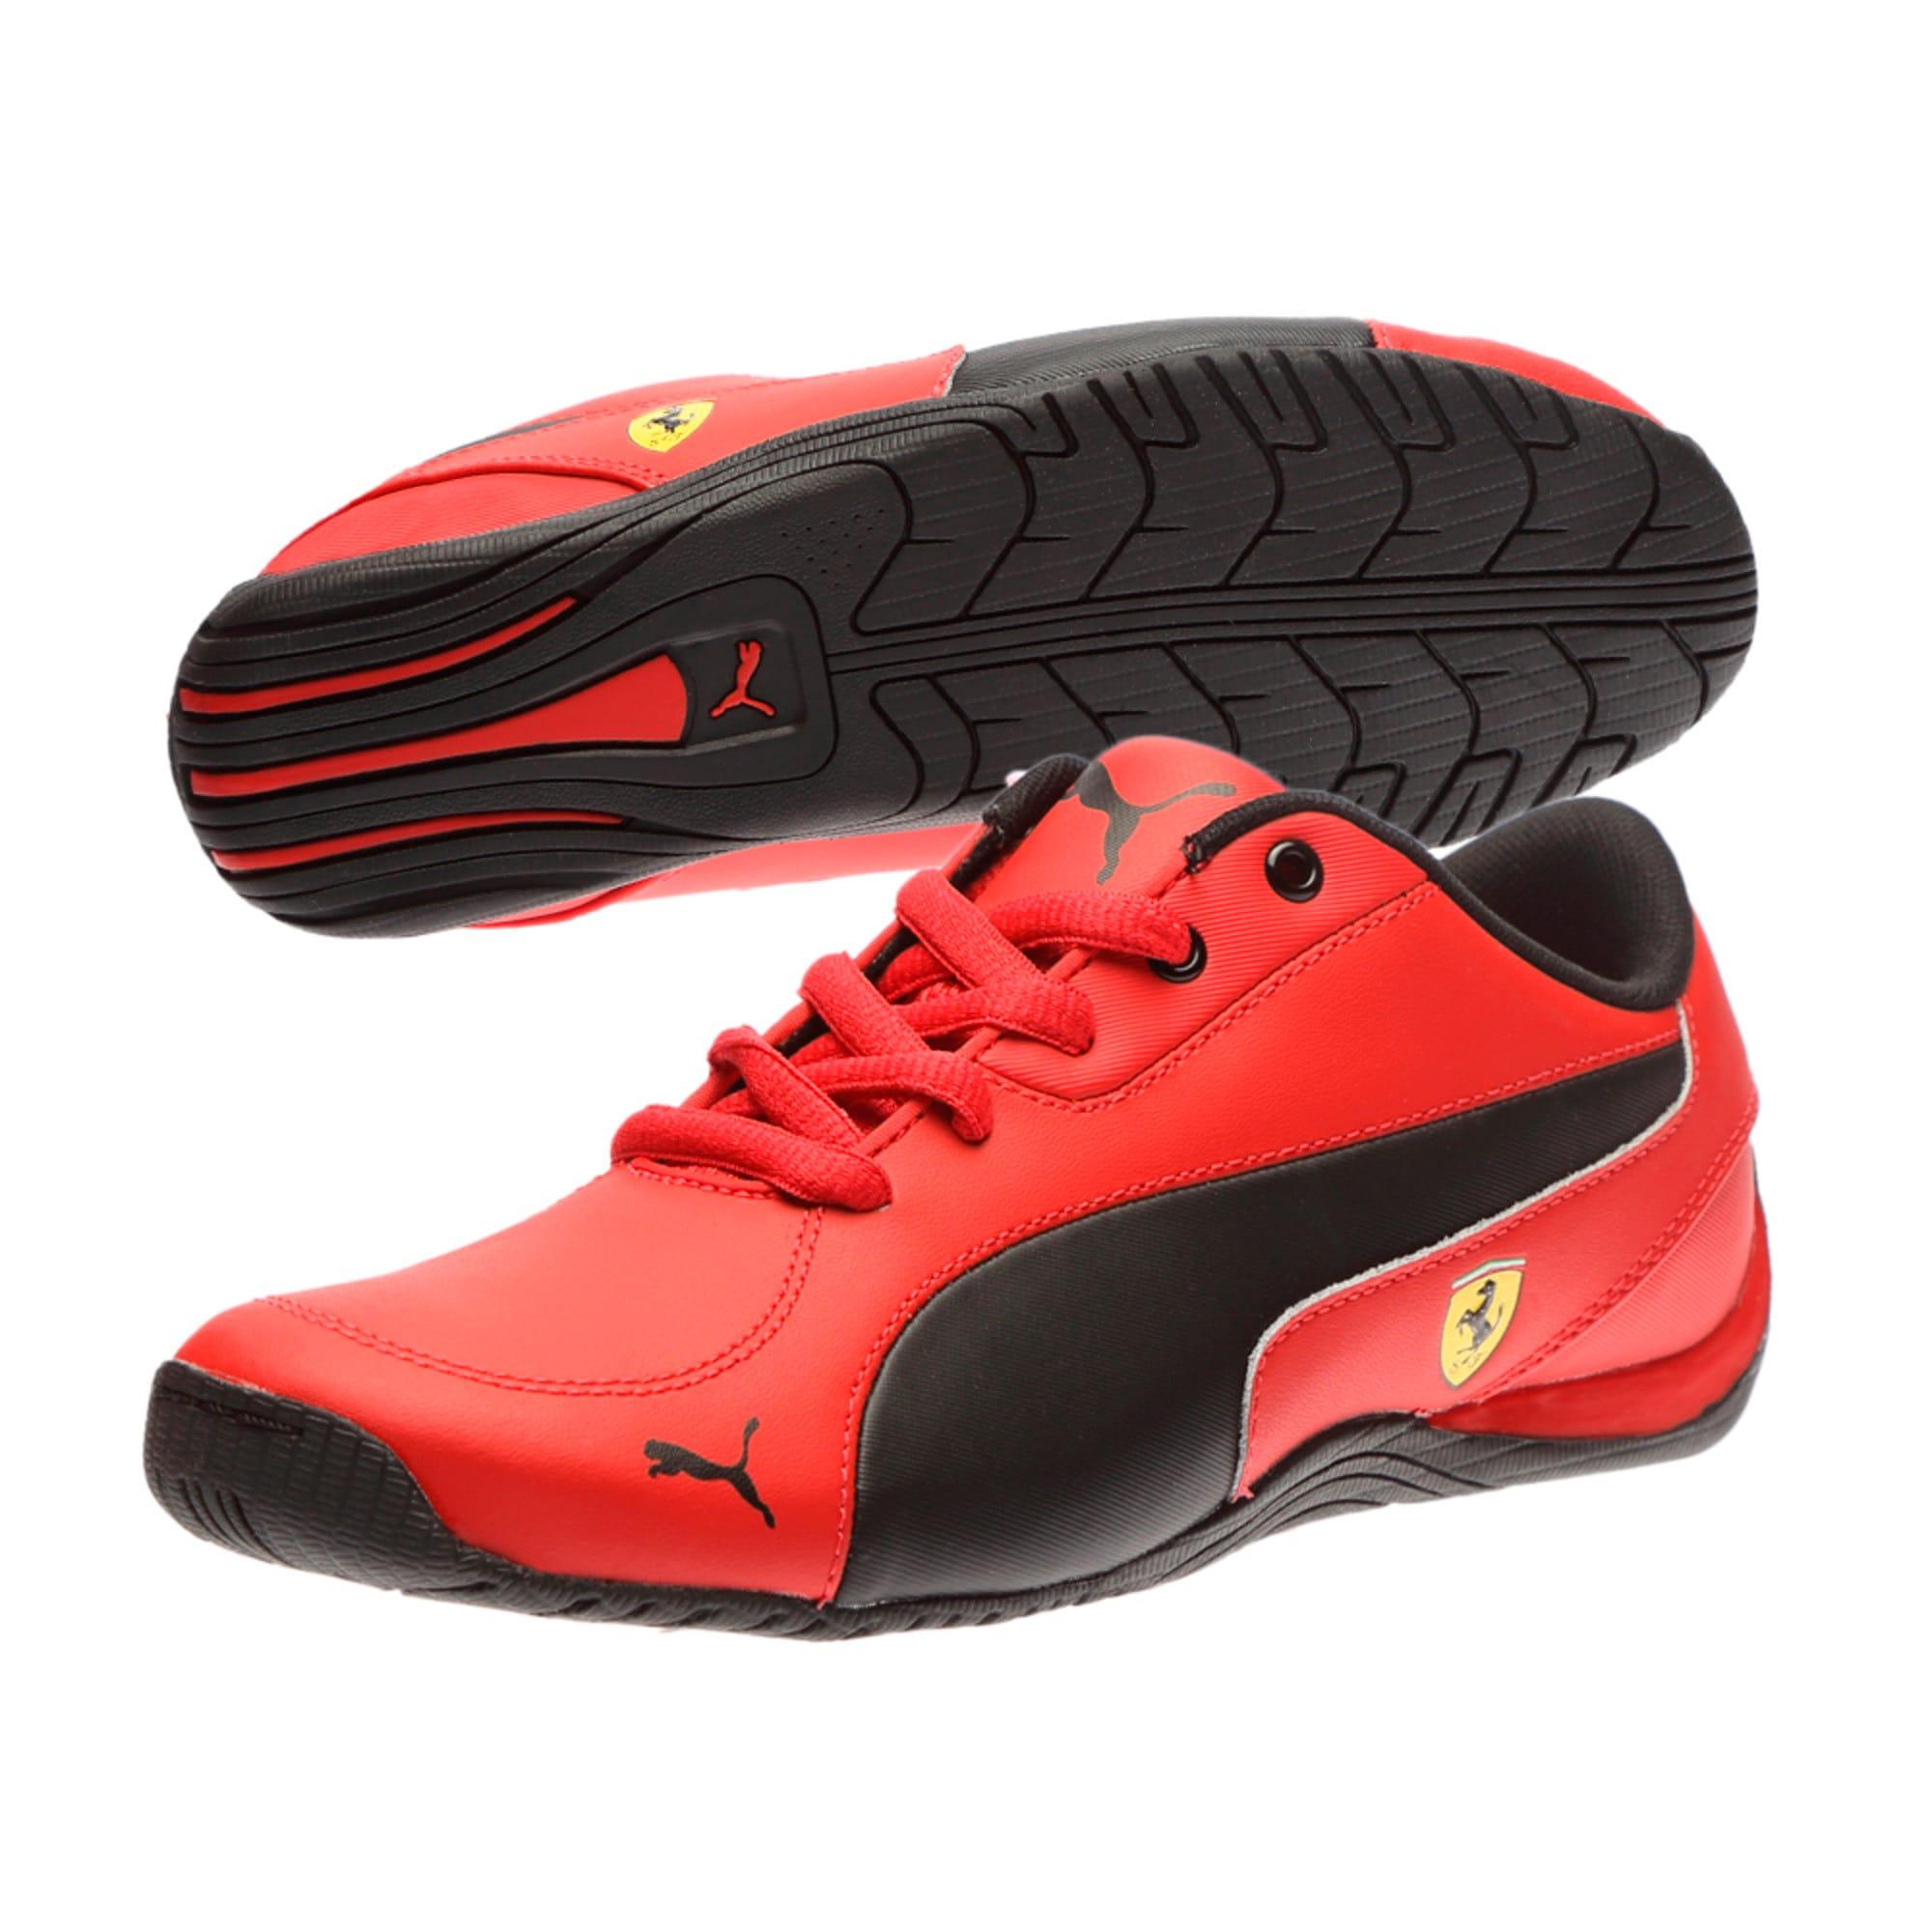 Thumbnail 6 of Ferrari Drift Cat 5 Jr. Trainers, Rosso Corsa-Puma Black, medium-IND